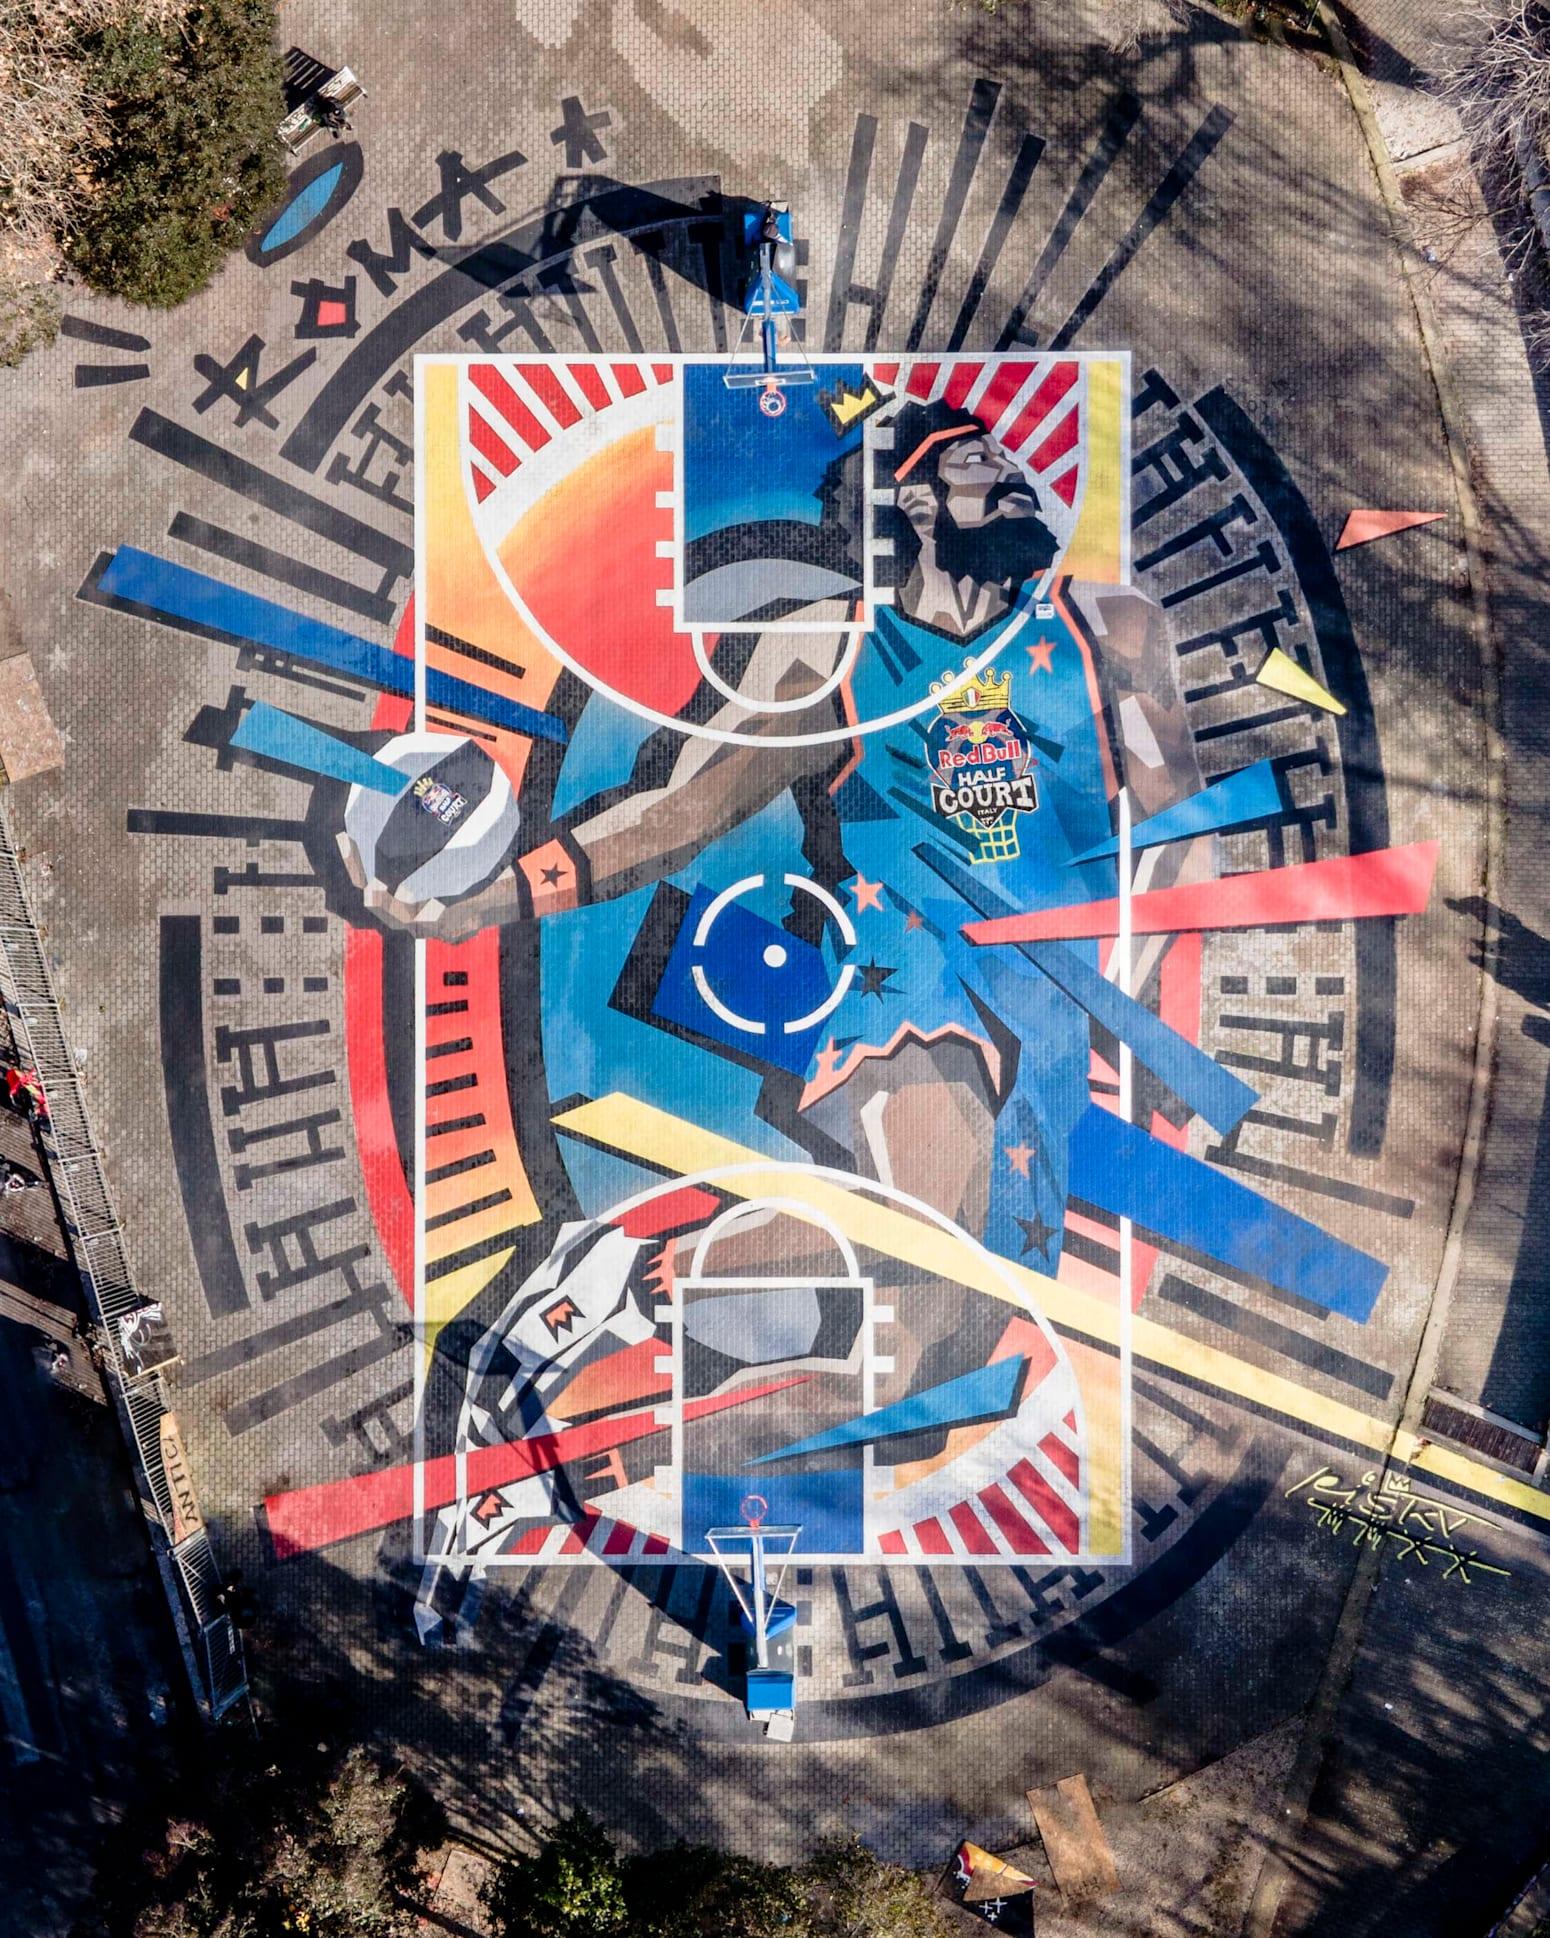 Vista dall'alto - Playground San Lorenzo roma